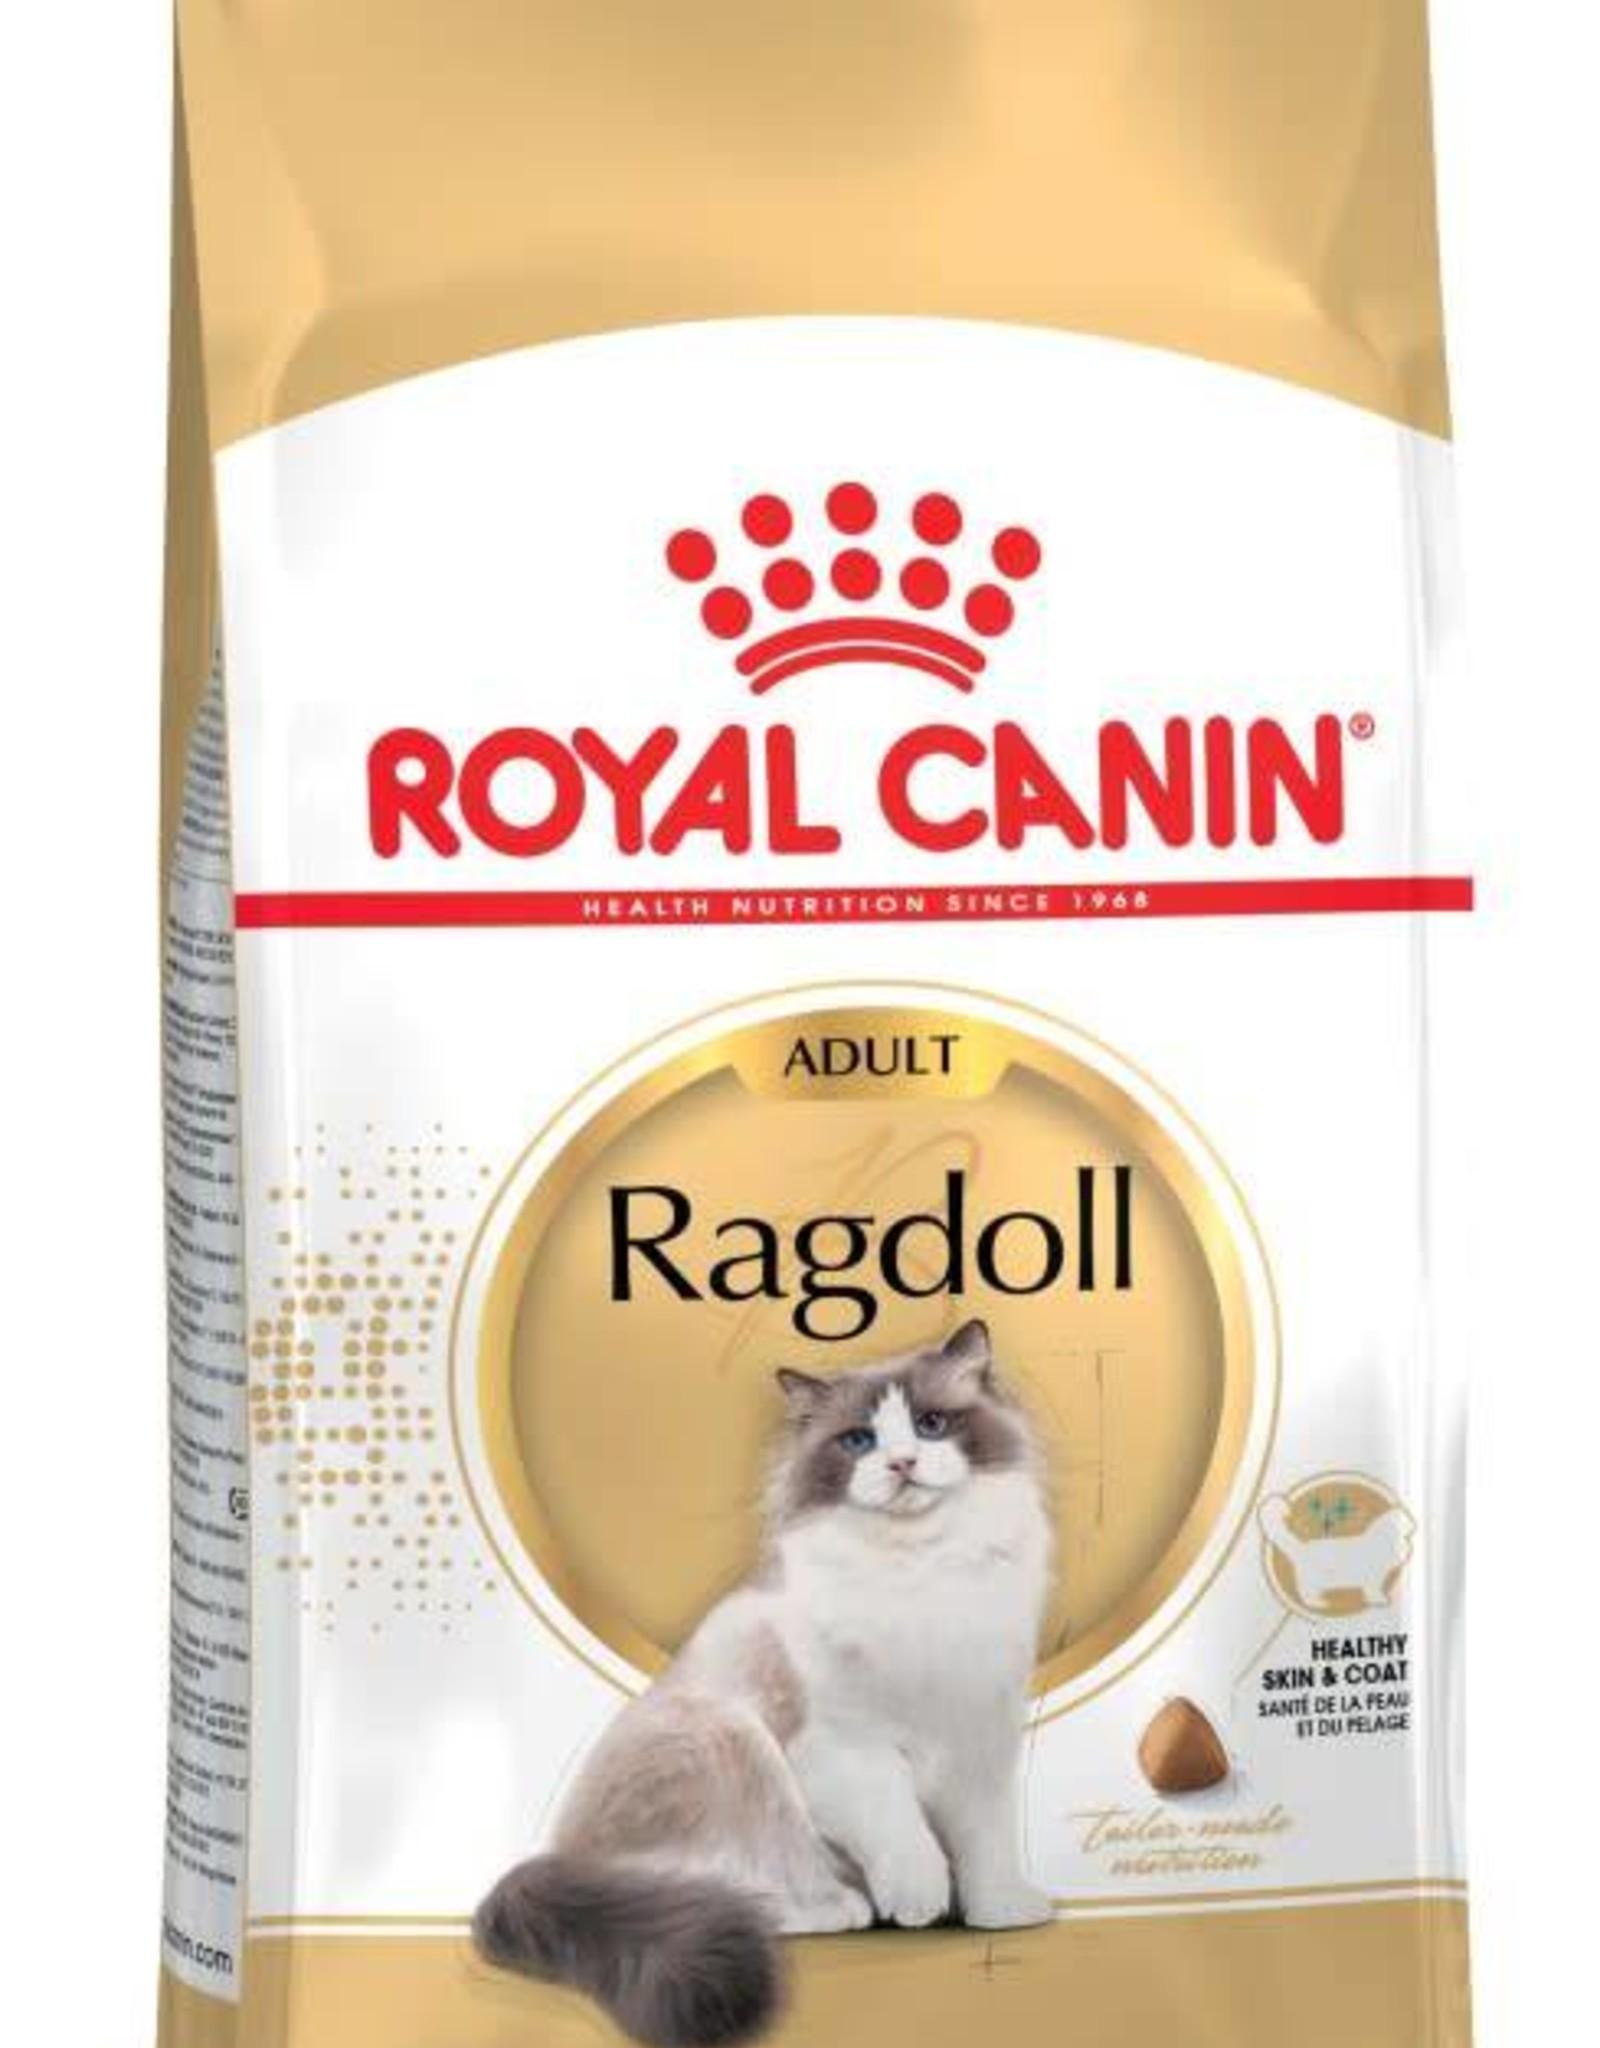 Royal Canin Ragdoll Adult Cat Dry Food, 2kg